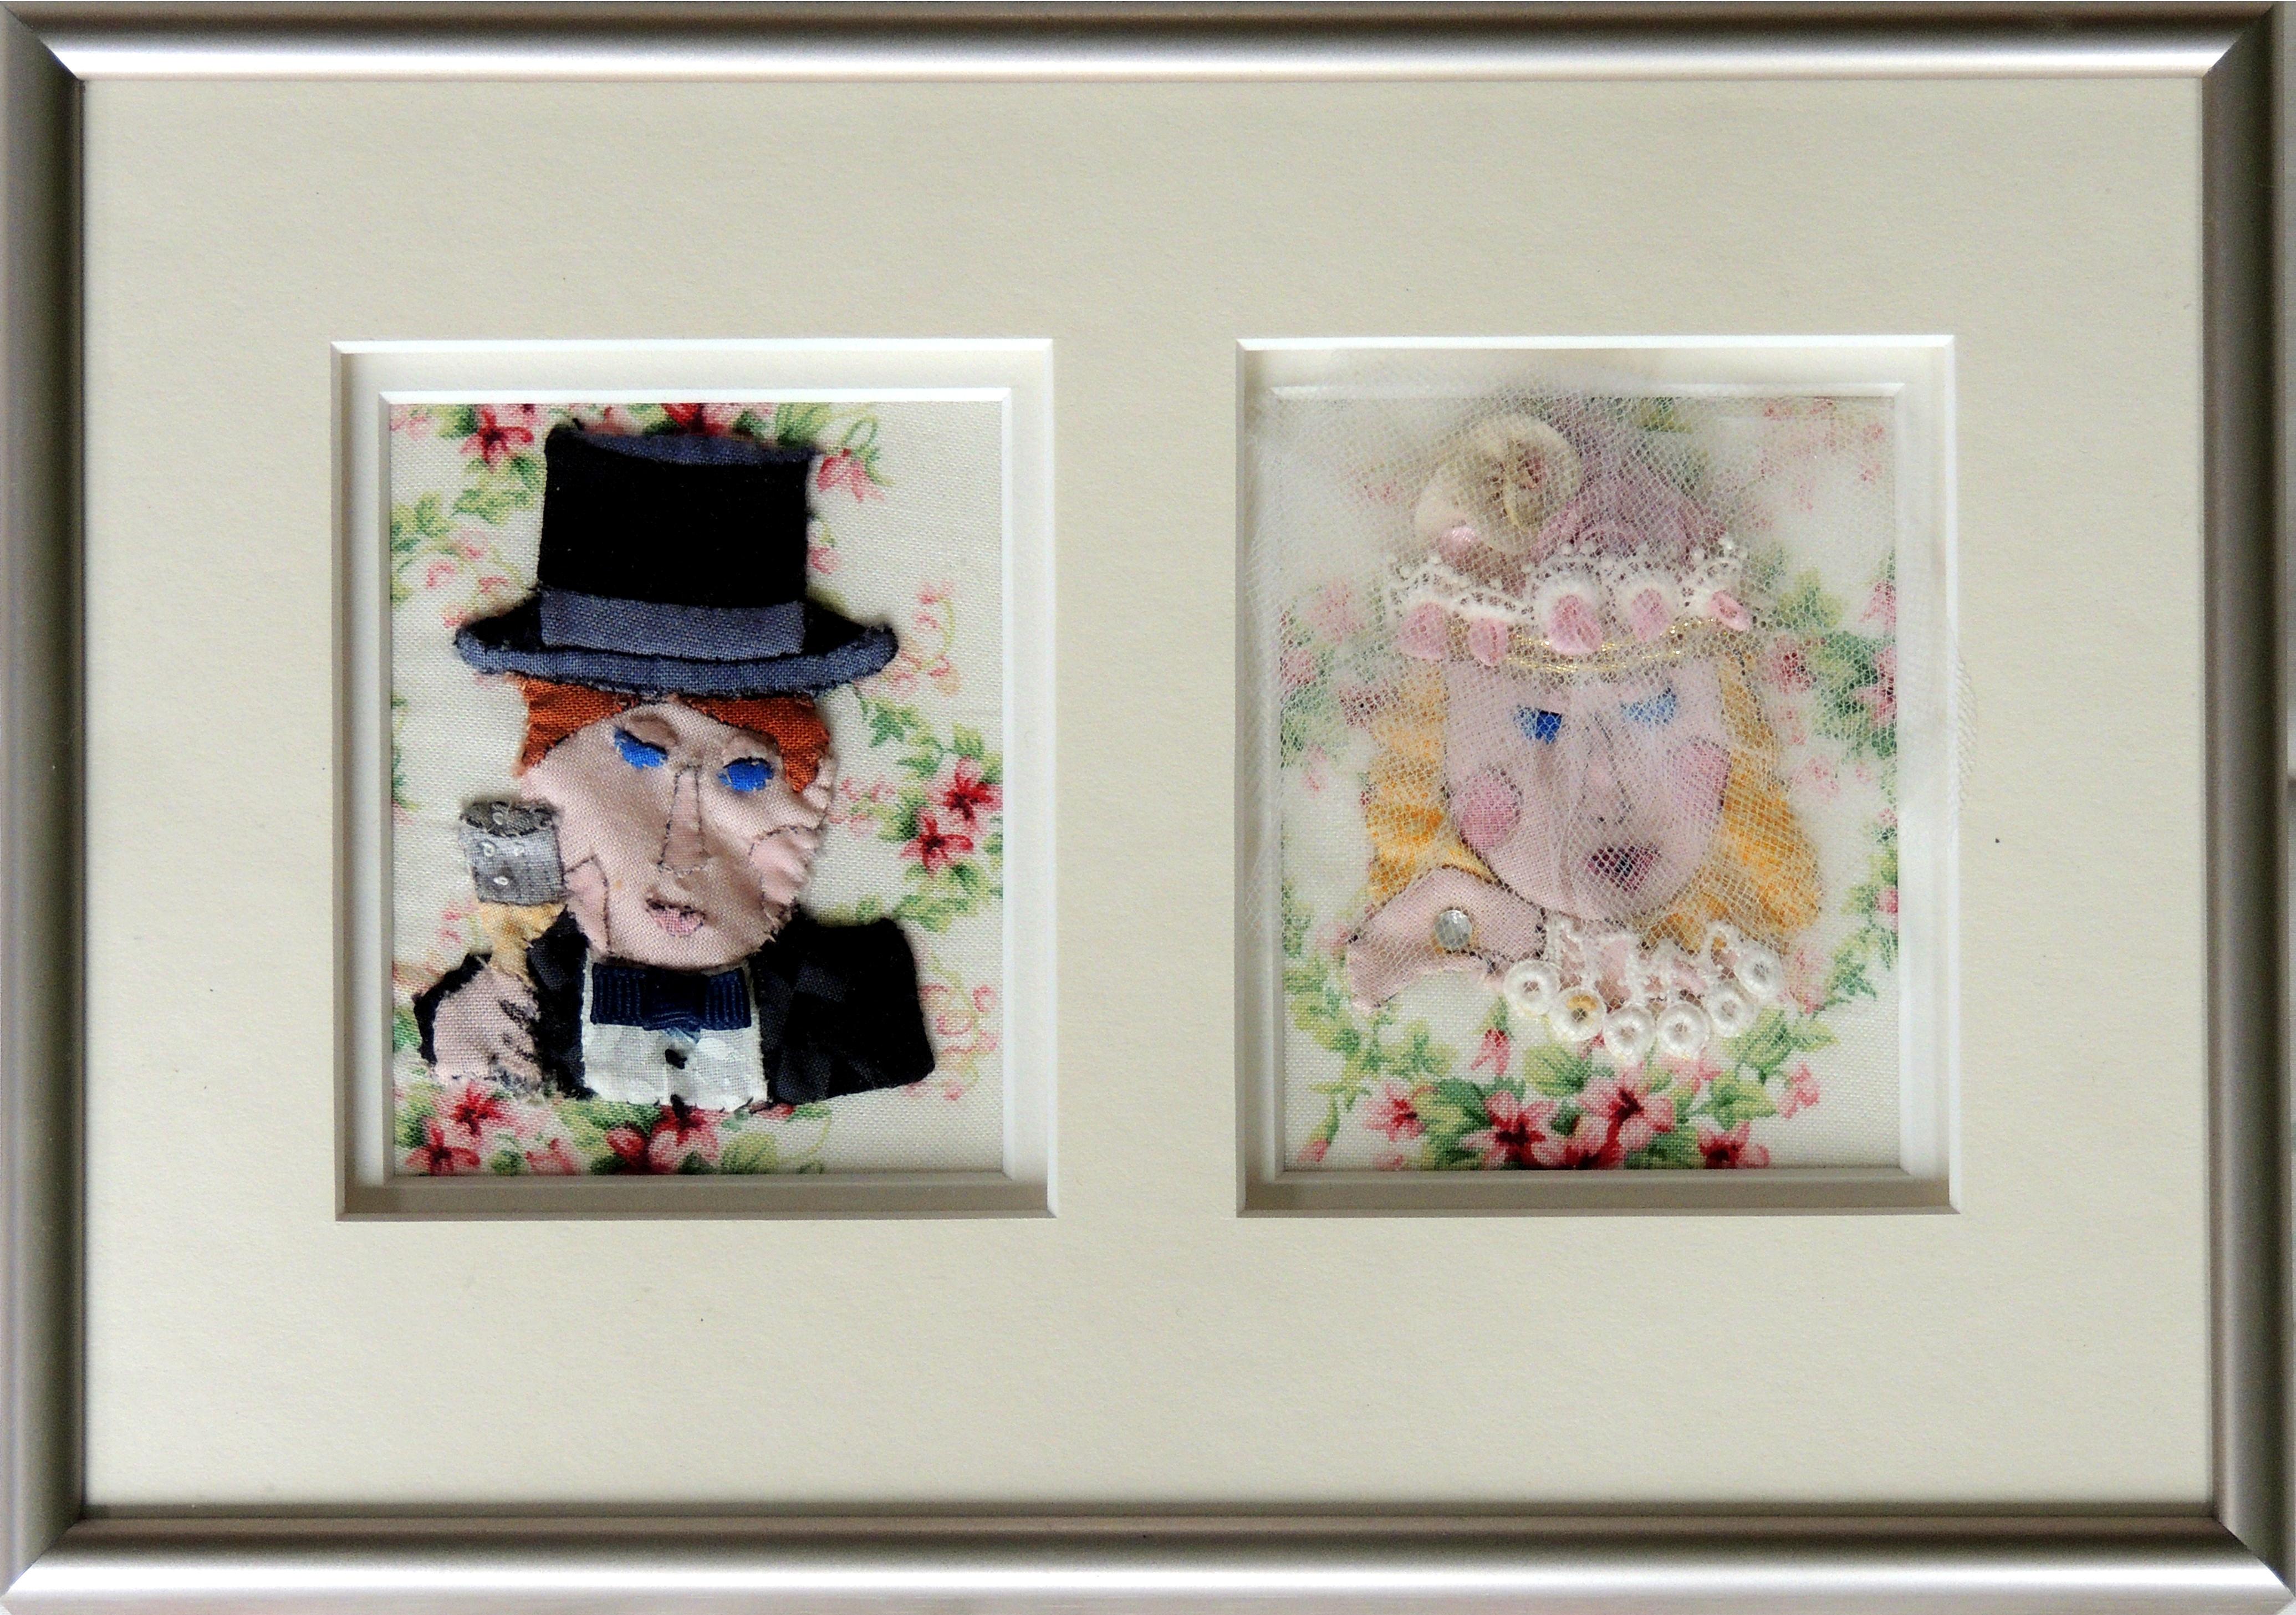 "Marianne Rabb Britton | BRIDE AND GROOM | Fabric & Embroidery | 7 x 10"" | Estate of Marianne Rabb Britton"